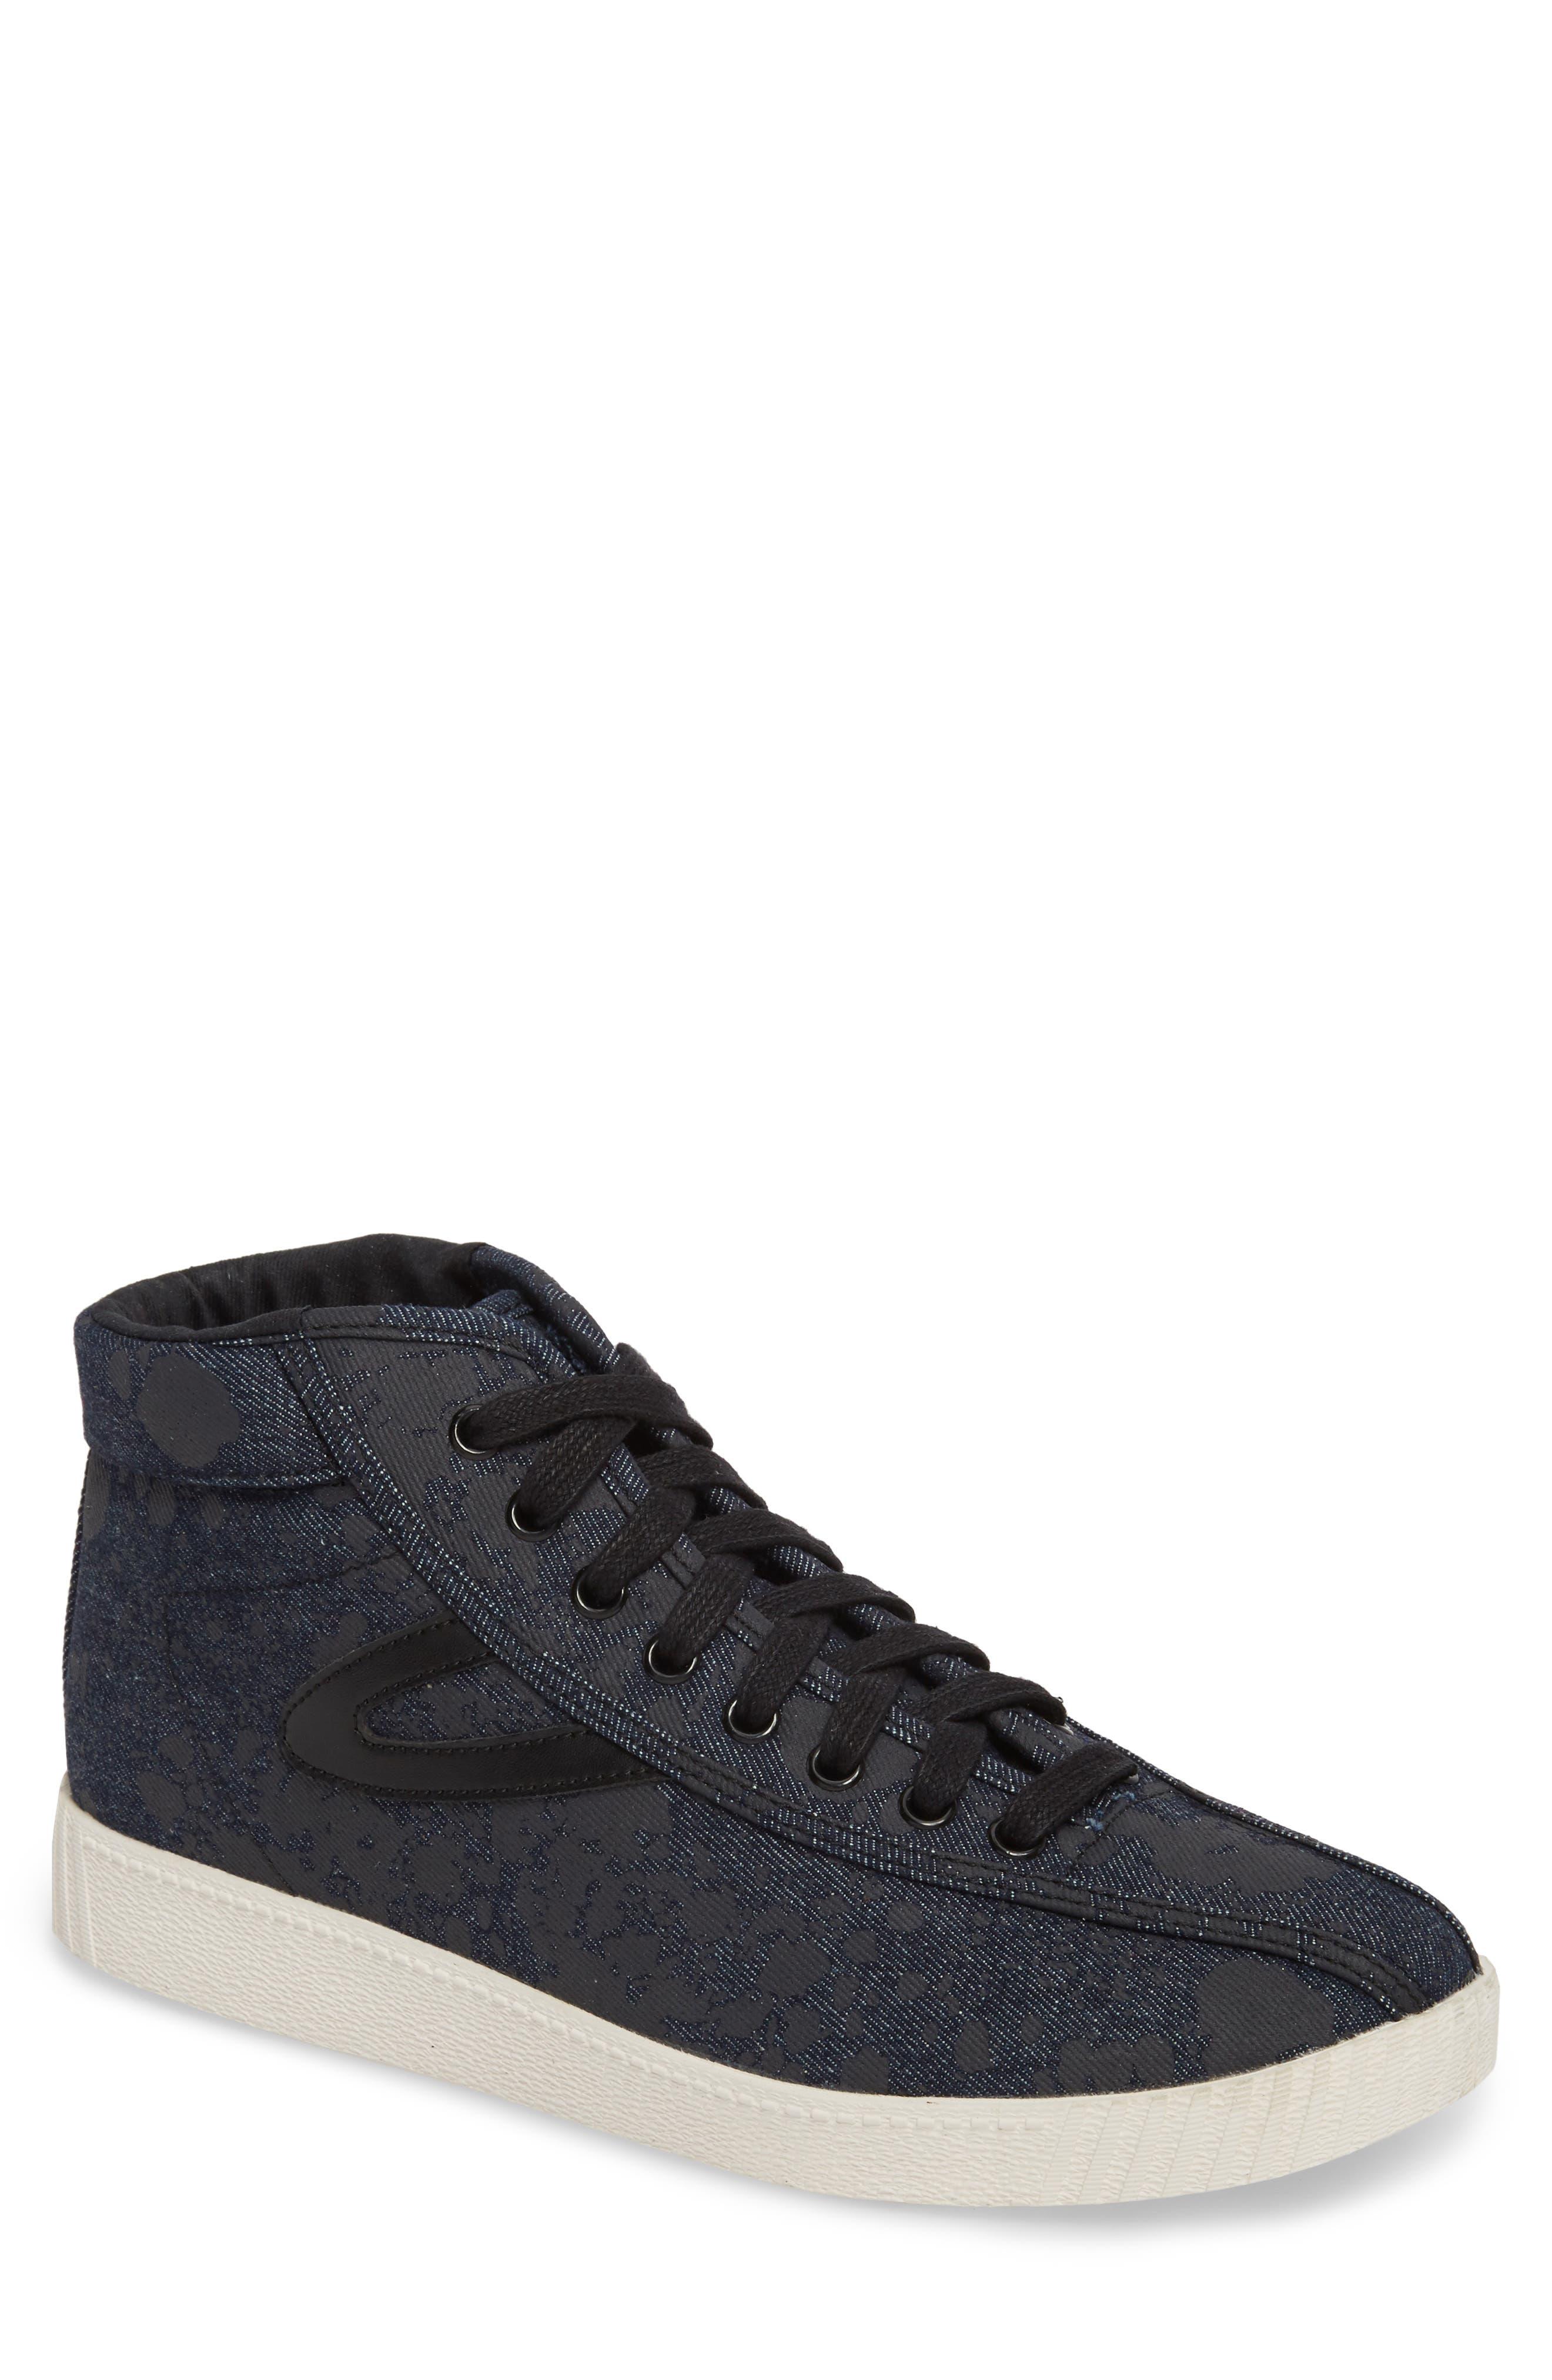 Nylite High Top Sneaker,                             Main thumbnail 1, color,                             Nero Opaco/ Black Denim